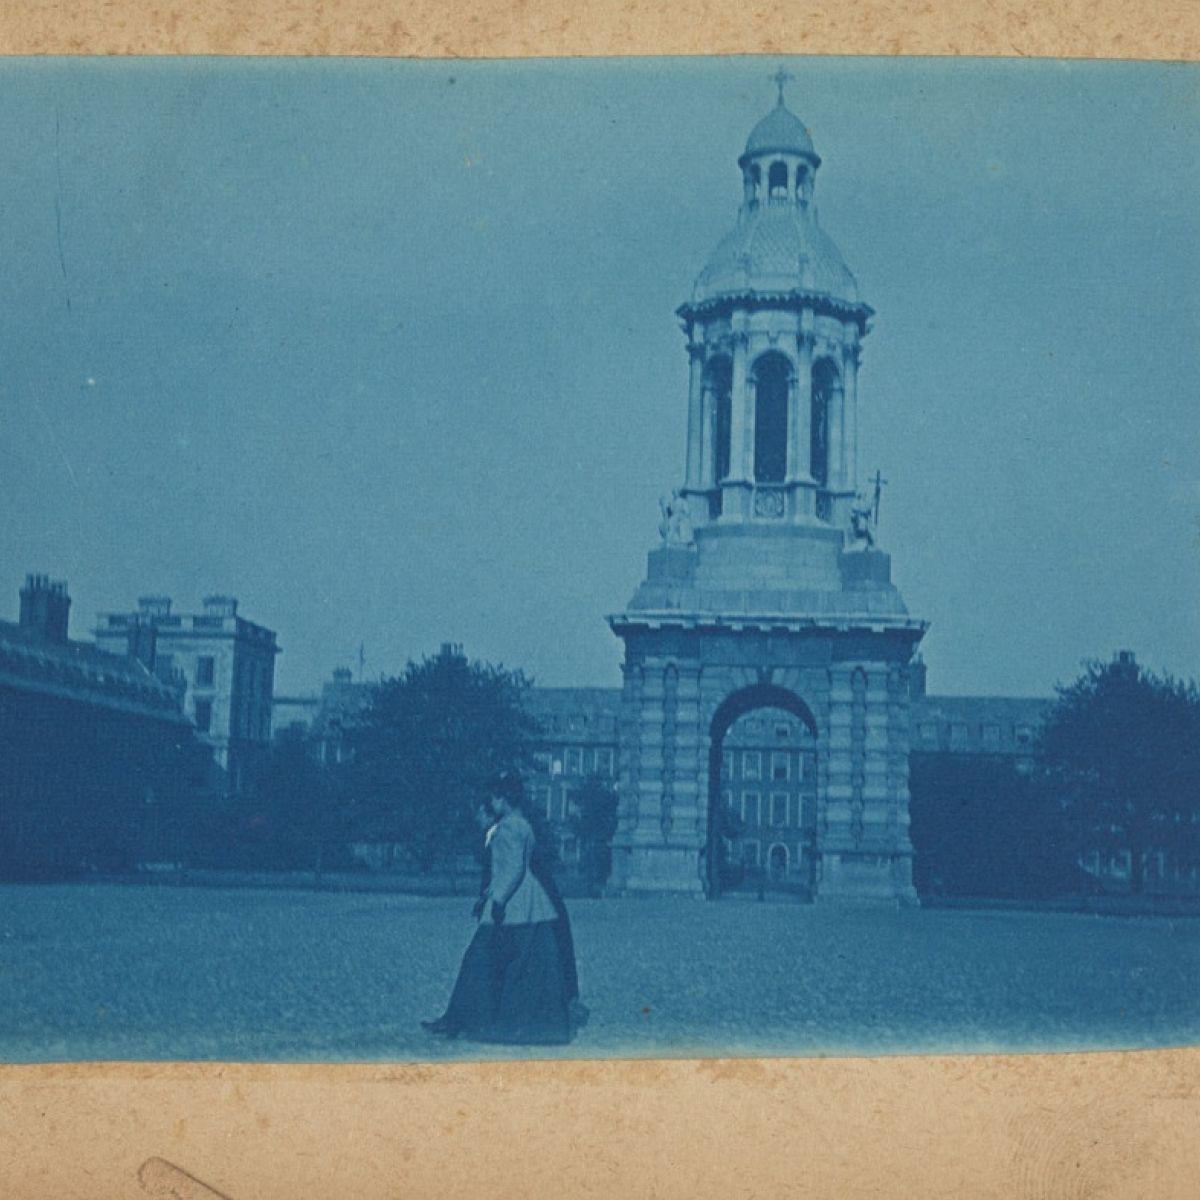 A literary treasure map of Trinity College Dublin